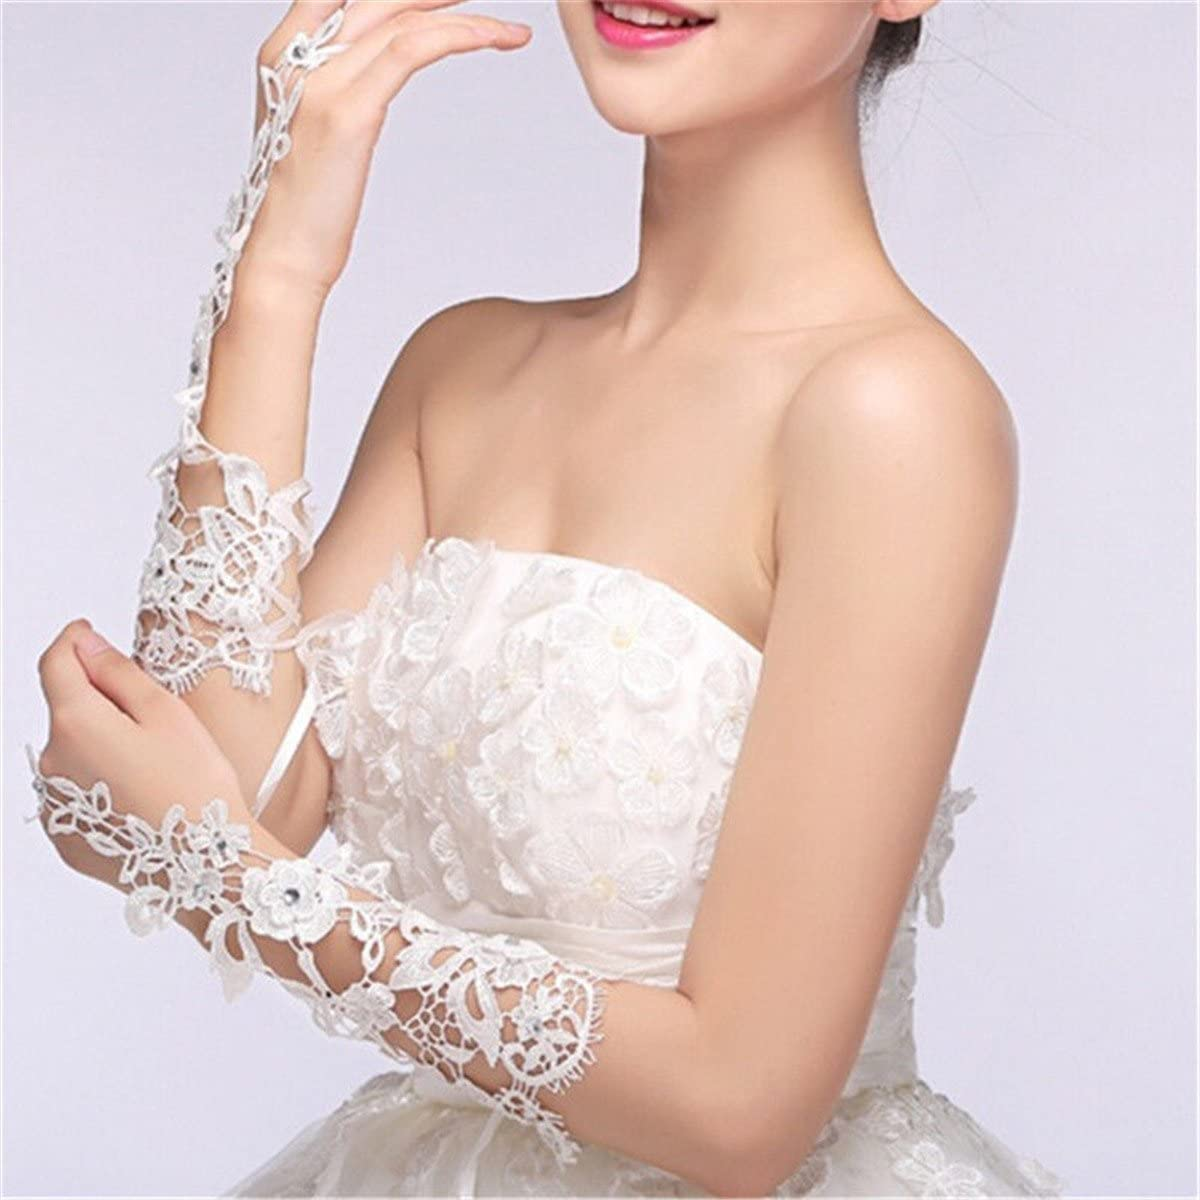 Bridal Lace Gloves Rhinestone Embellished Wrist Gloves for Wedding